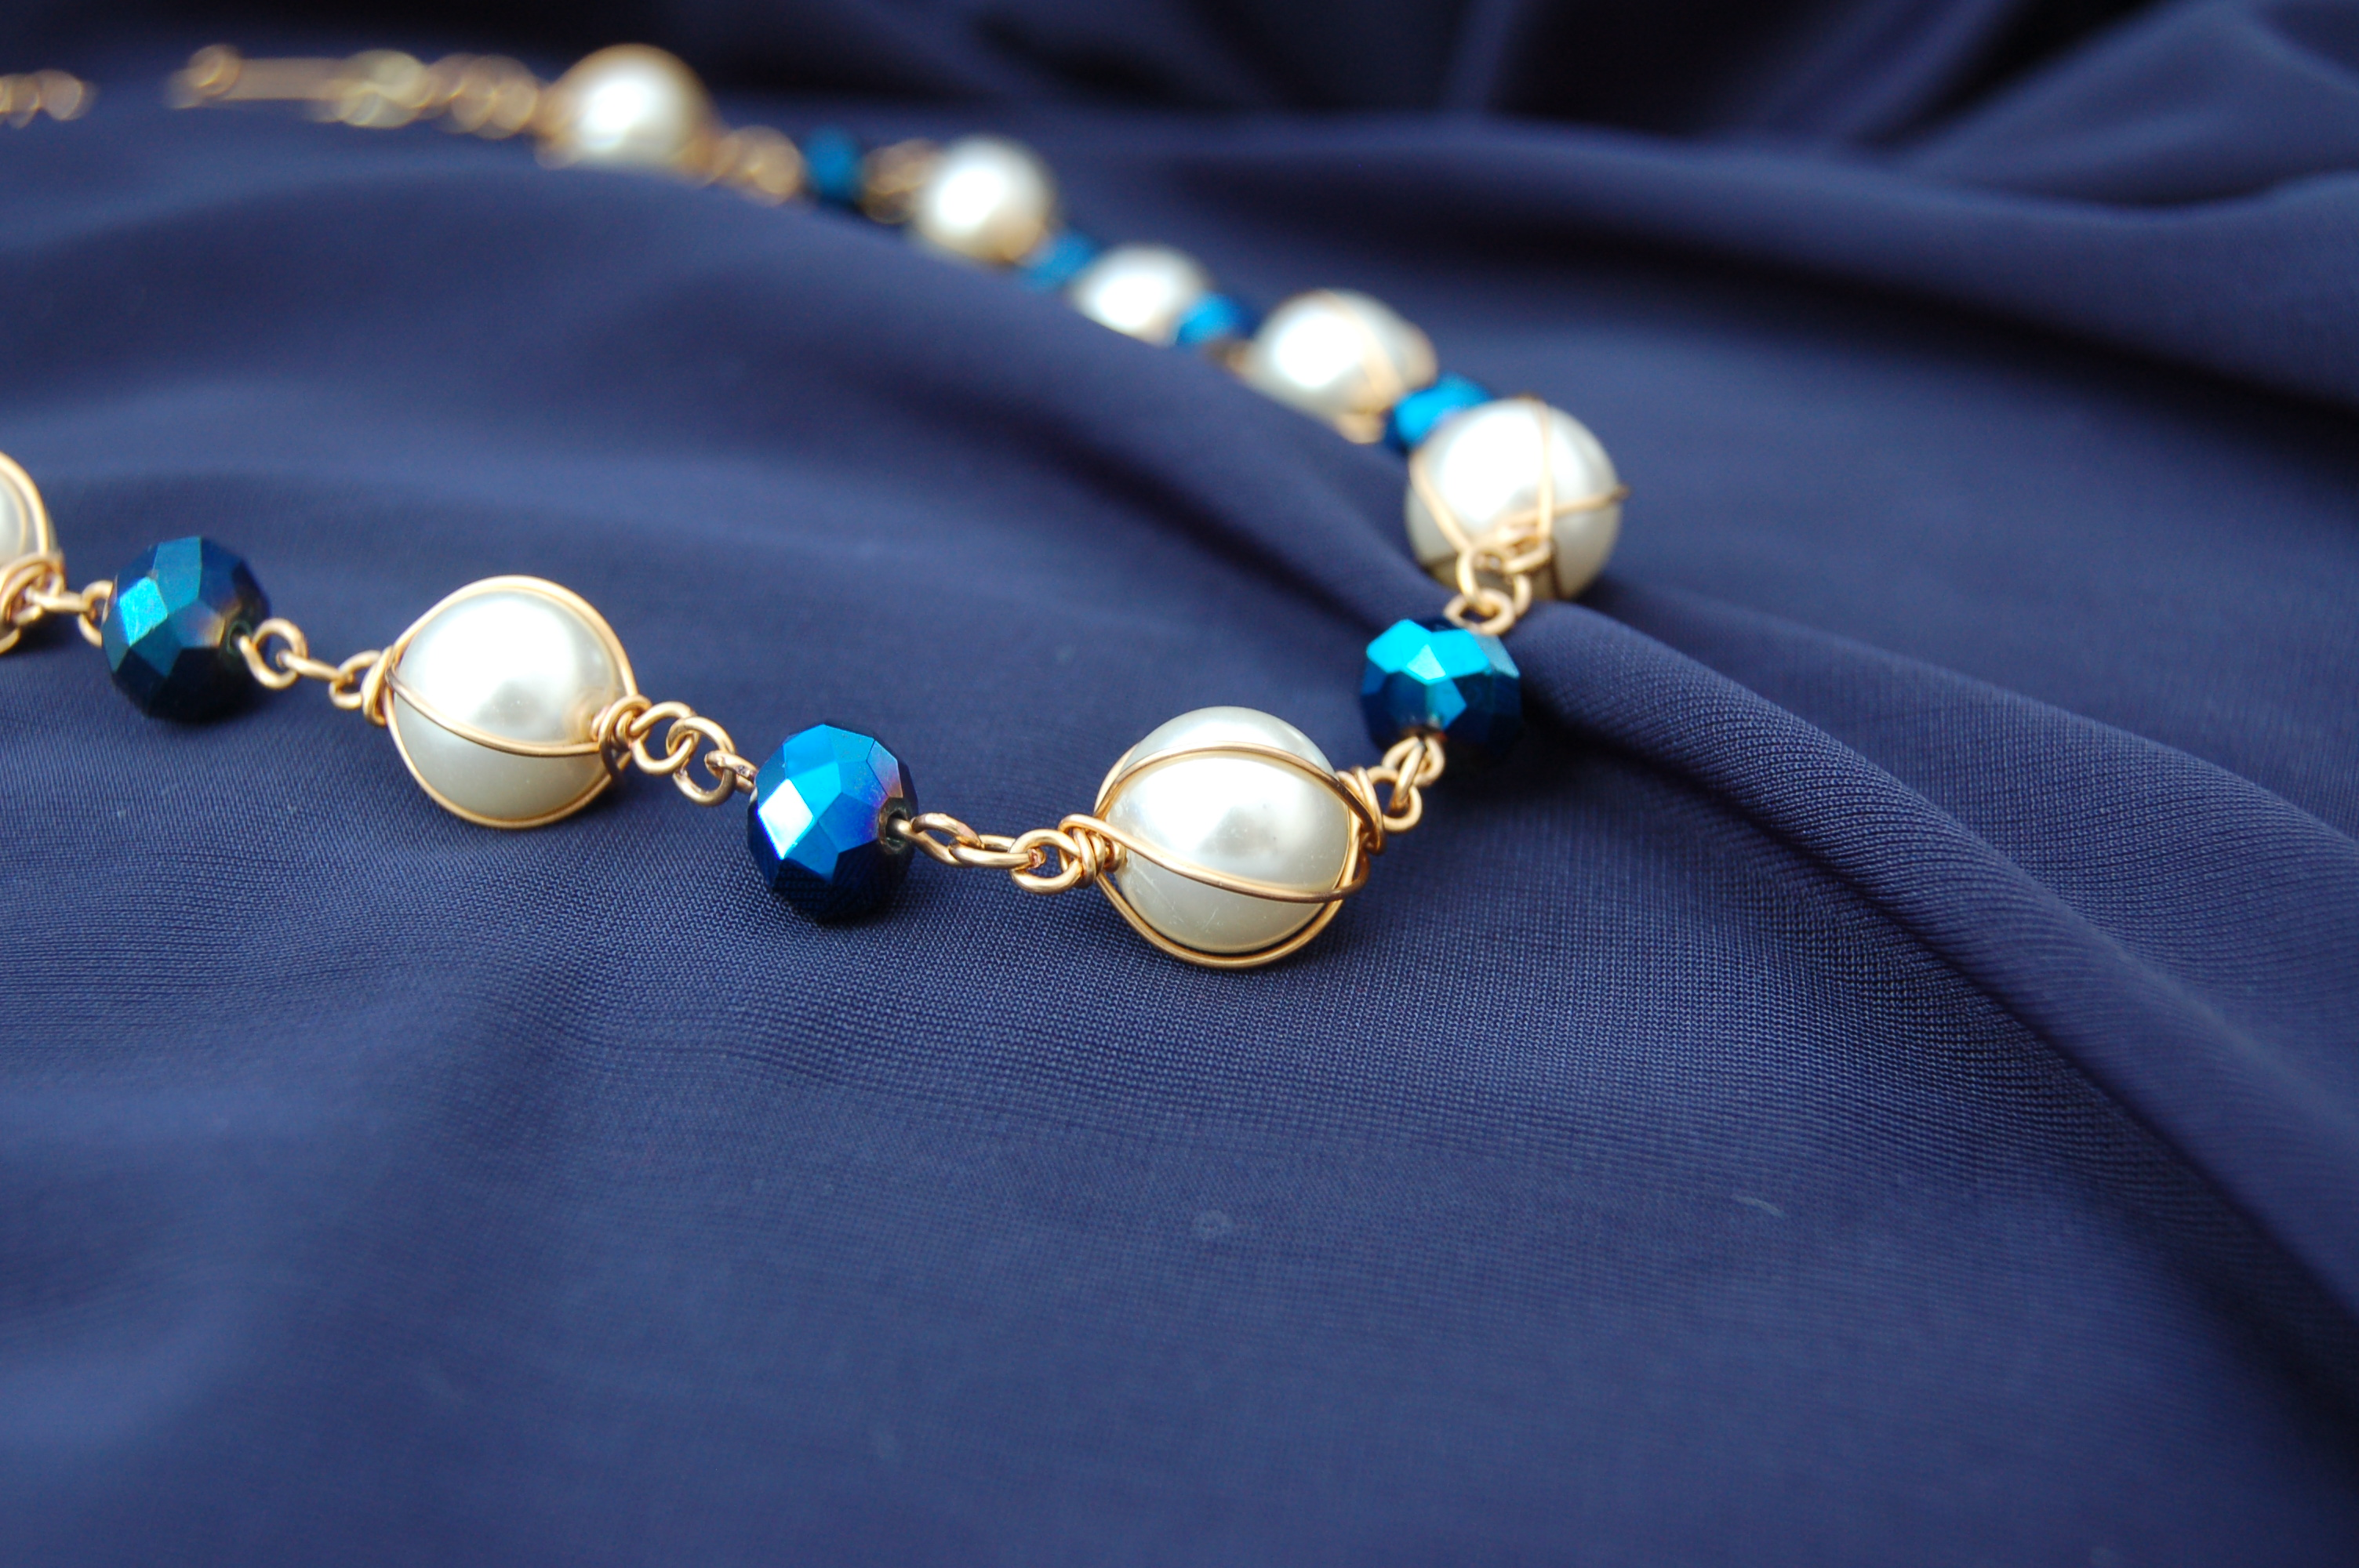 J Bow Jewellery